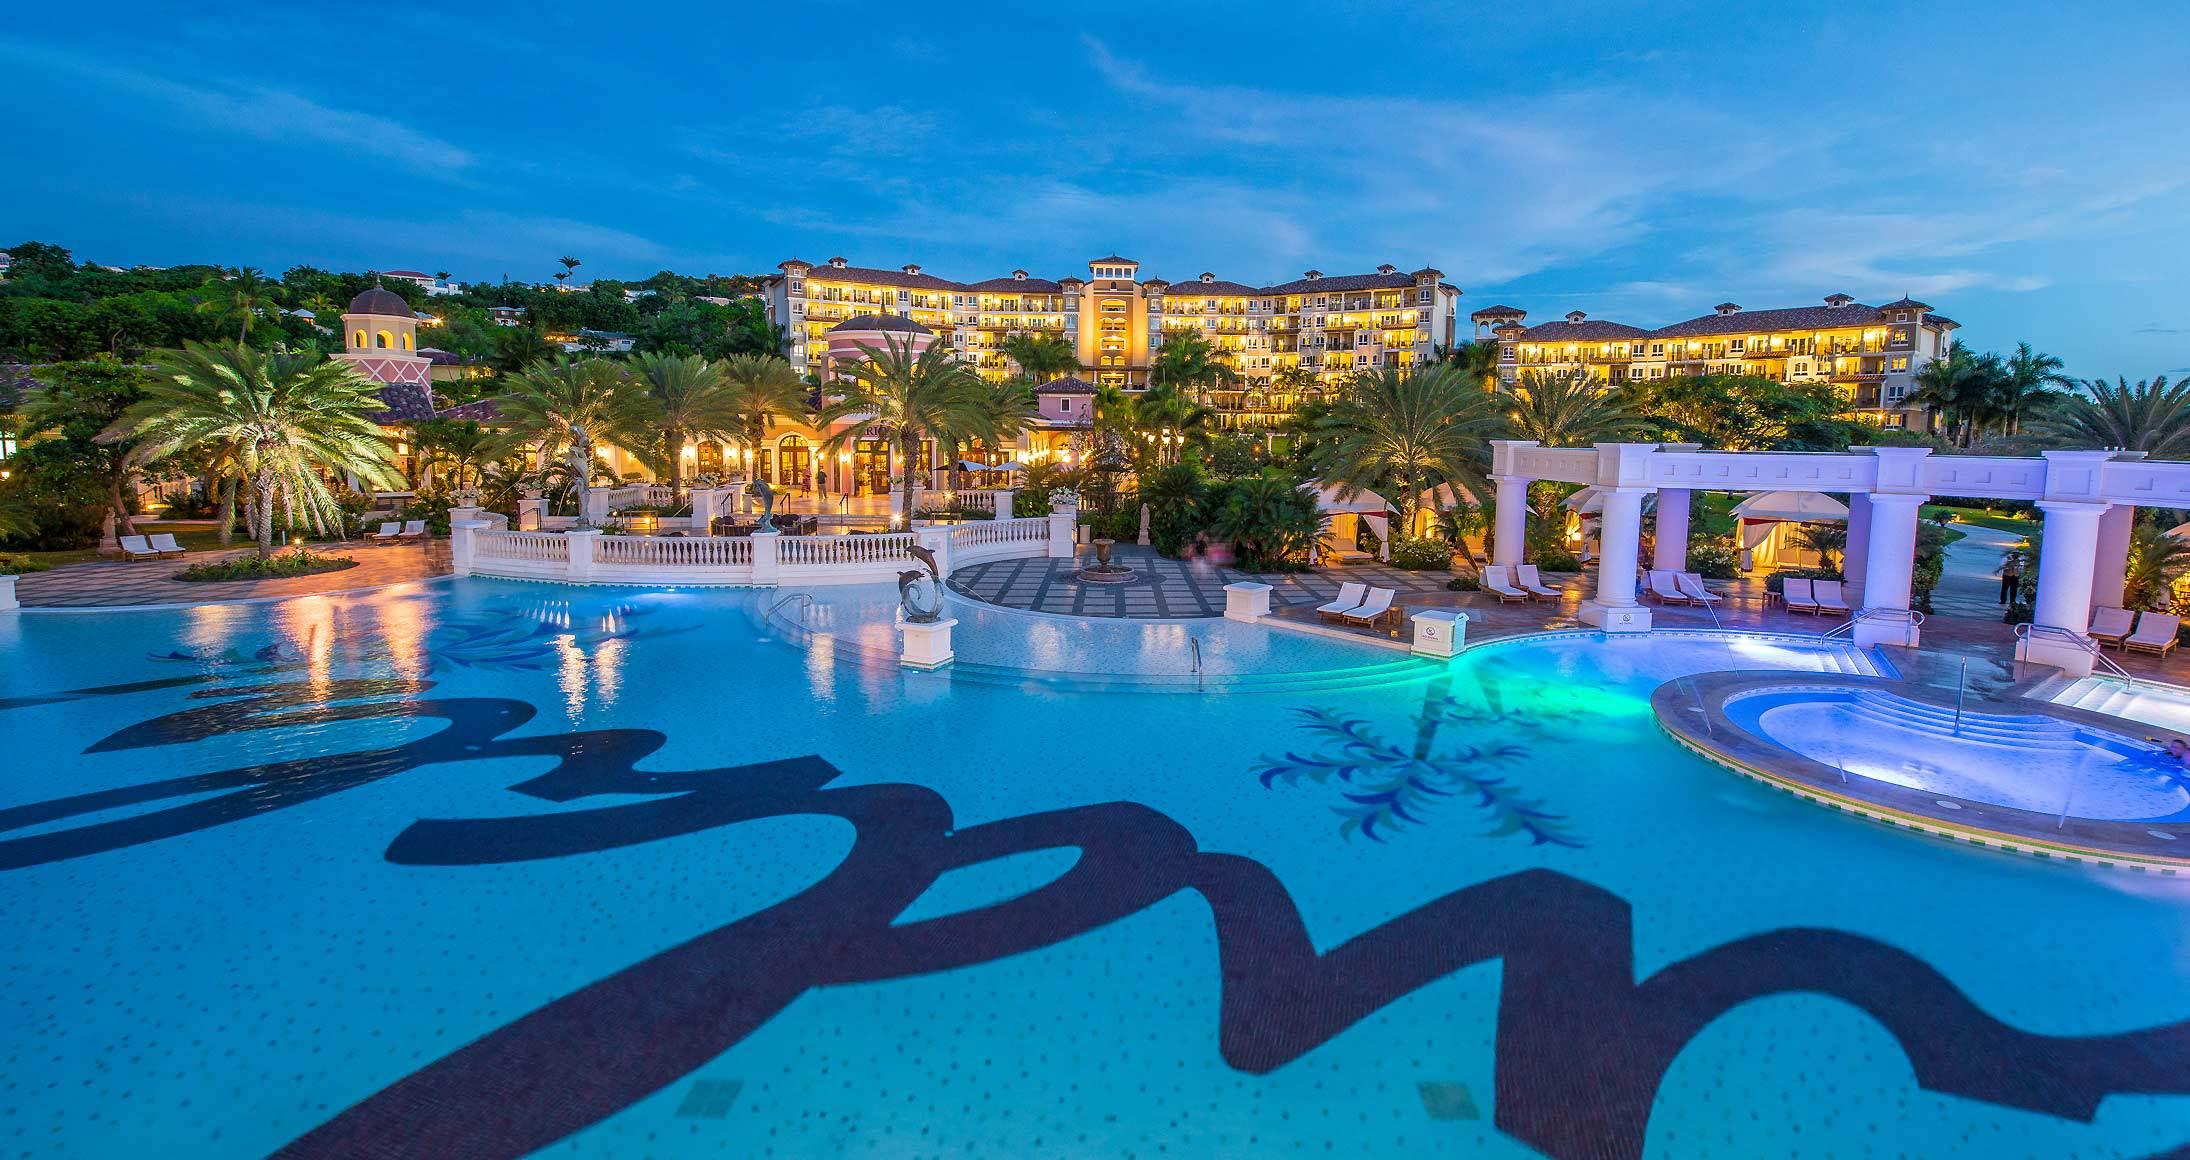 Sandals Grande Antigua - All-Inclusive Luxury Resort in St